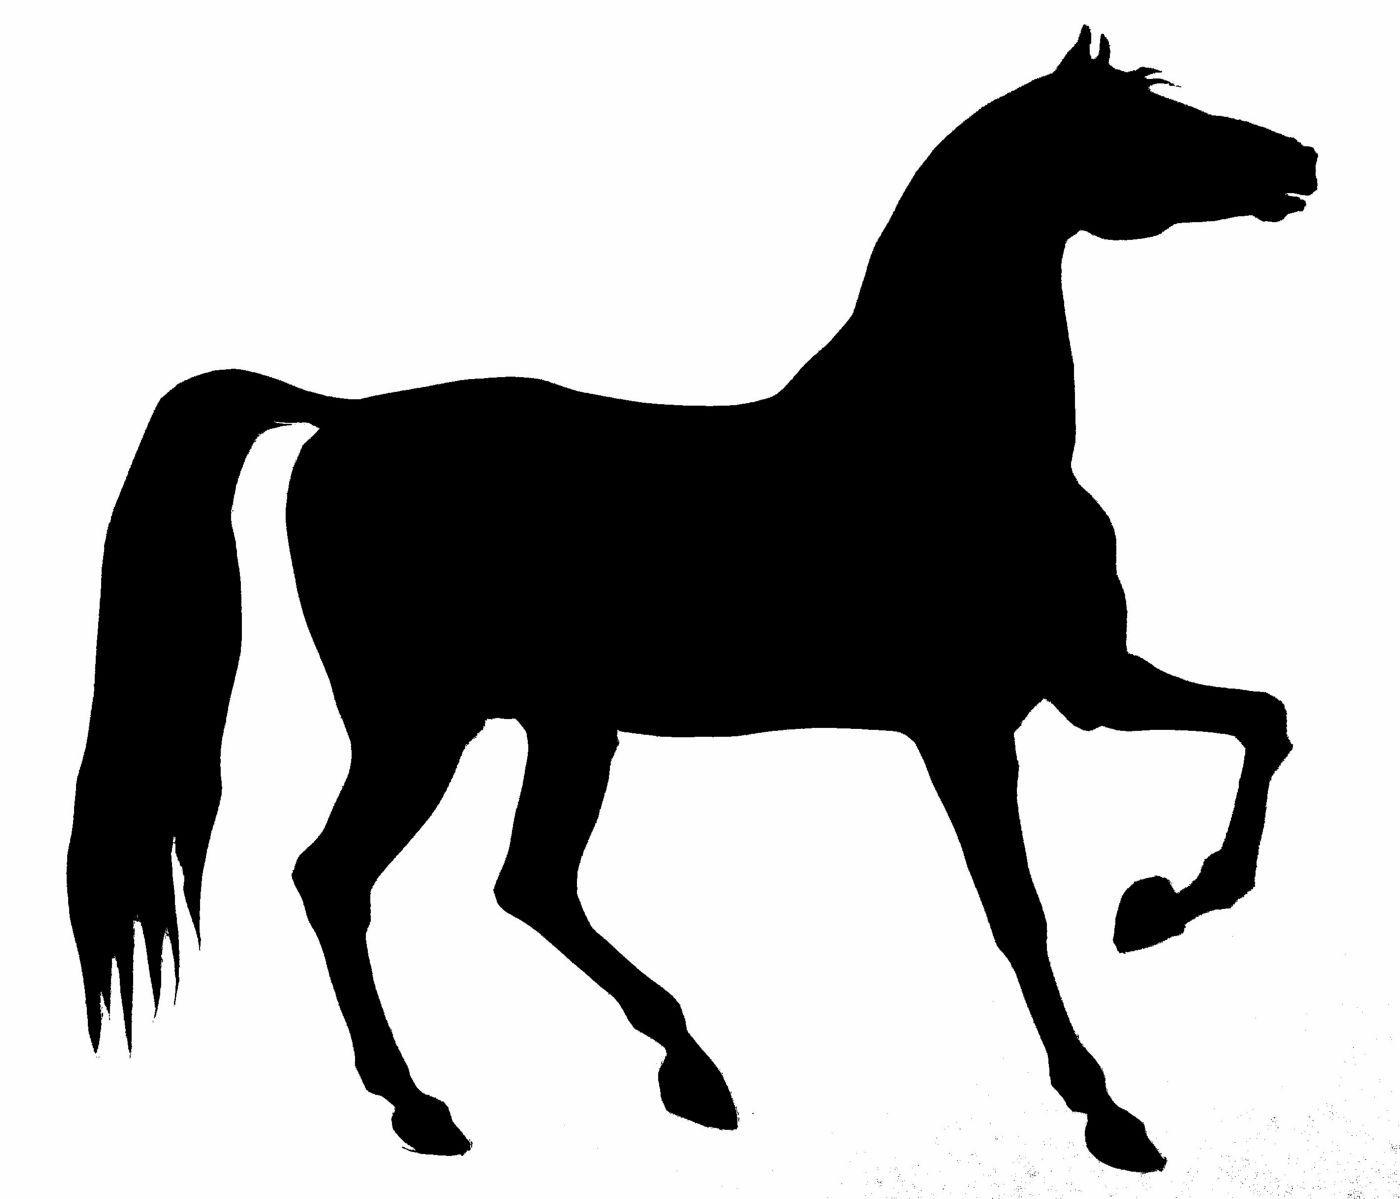 1400x1199 Horse Silhouette Horse Silhouette Stencil Silhouettes